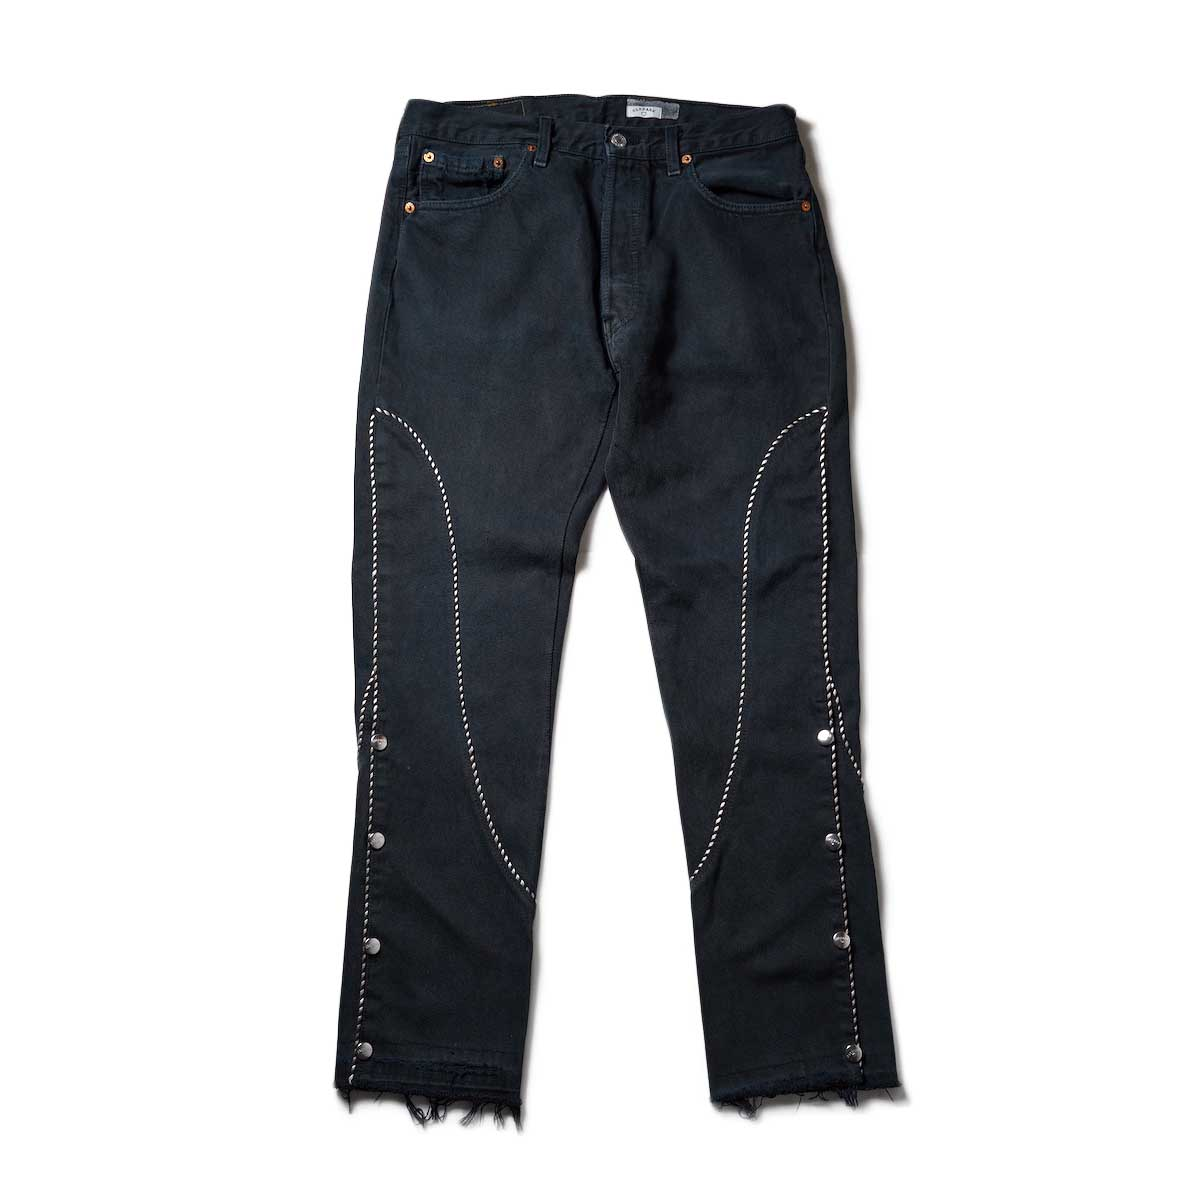 OLD PARK / Western Jeans2 Black (Msize-A)